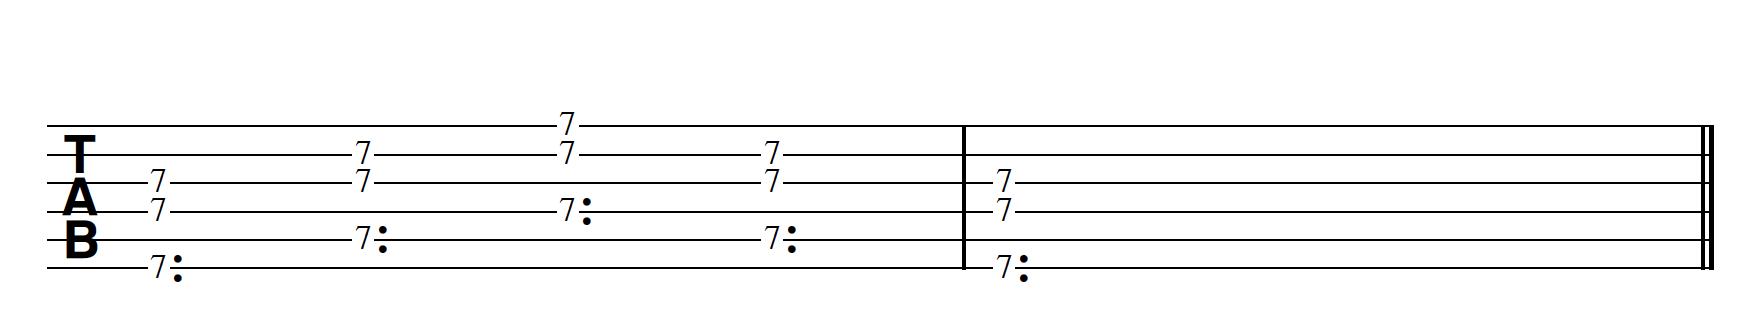 Harp Harmonic Pattern 3 Notes Together Bm7/11